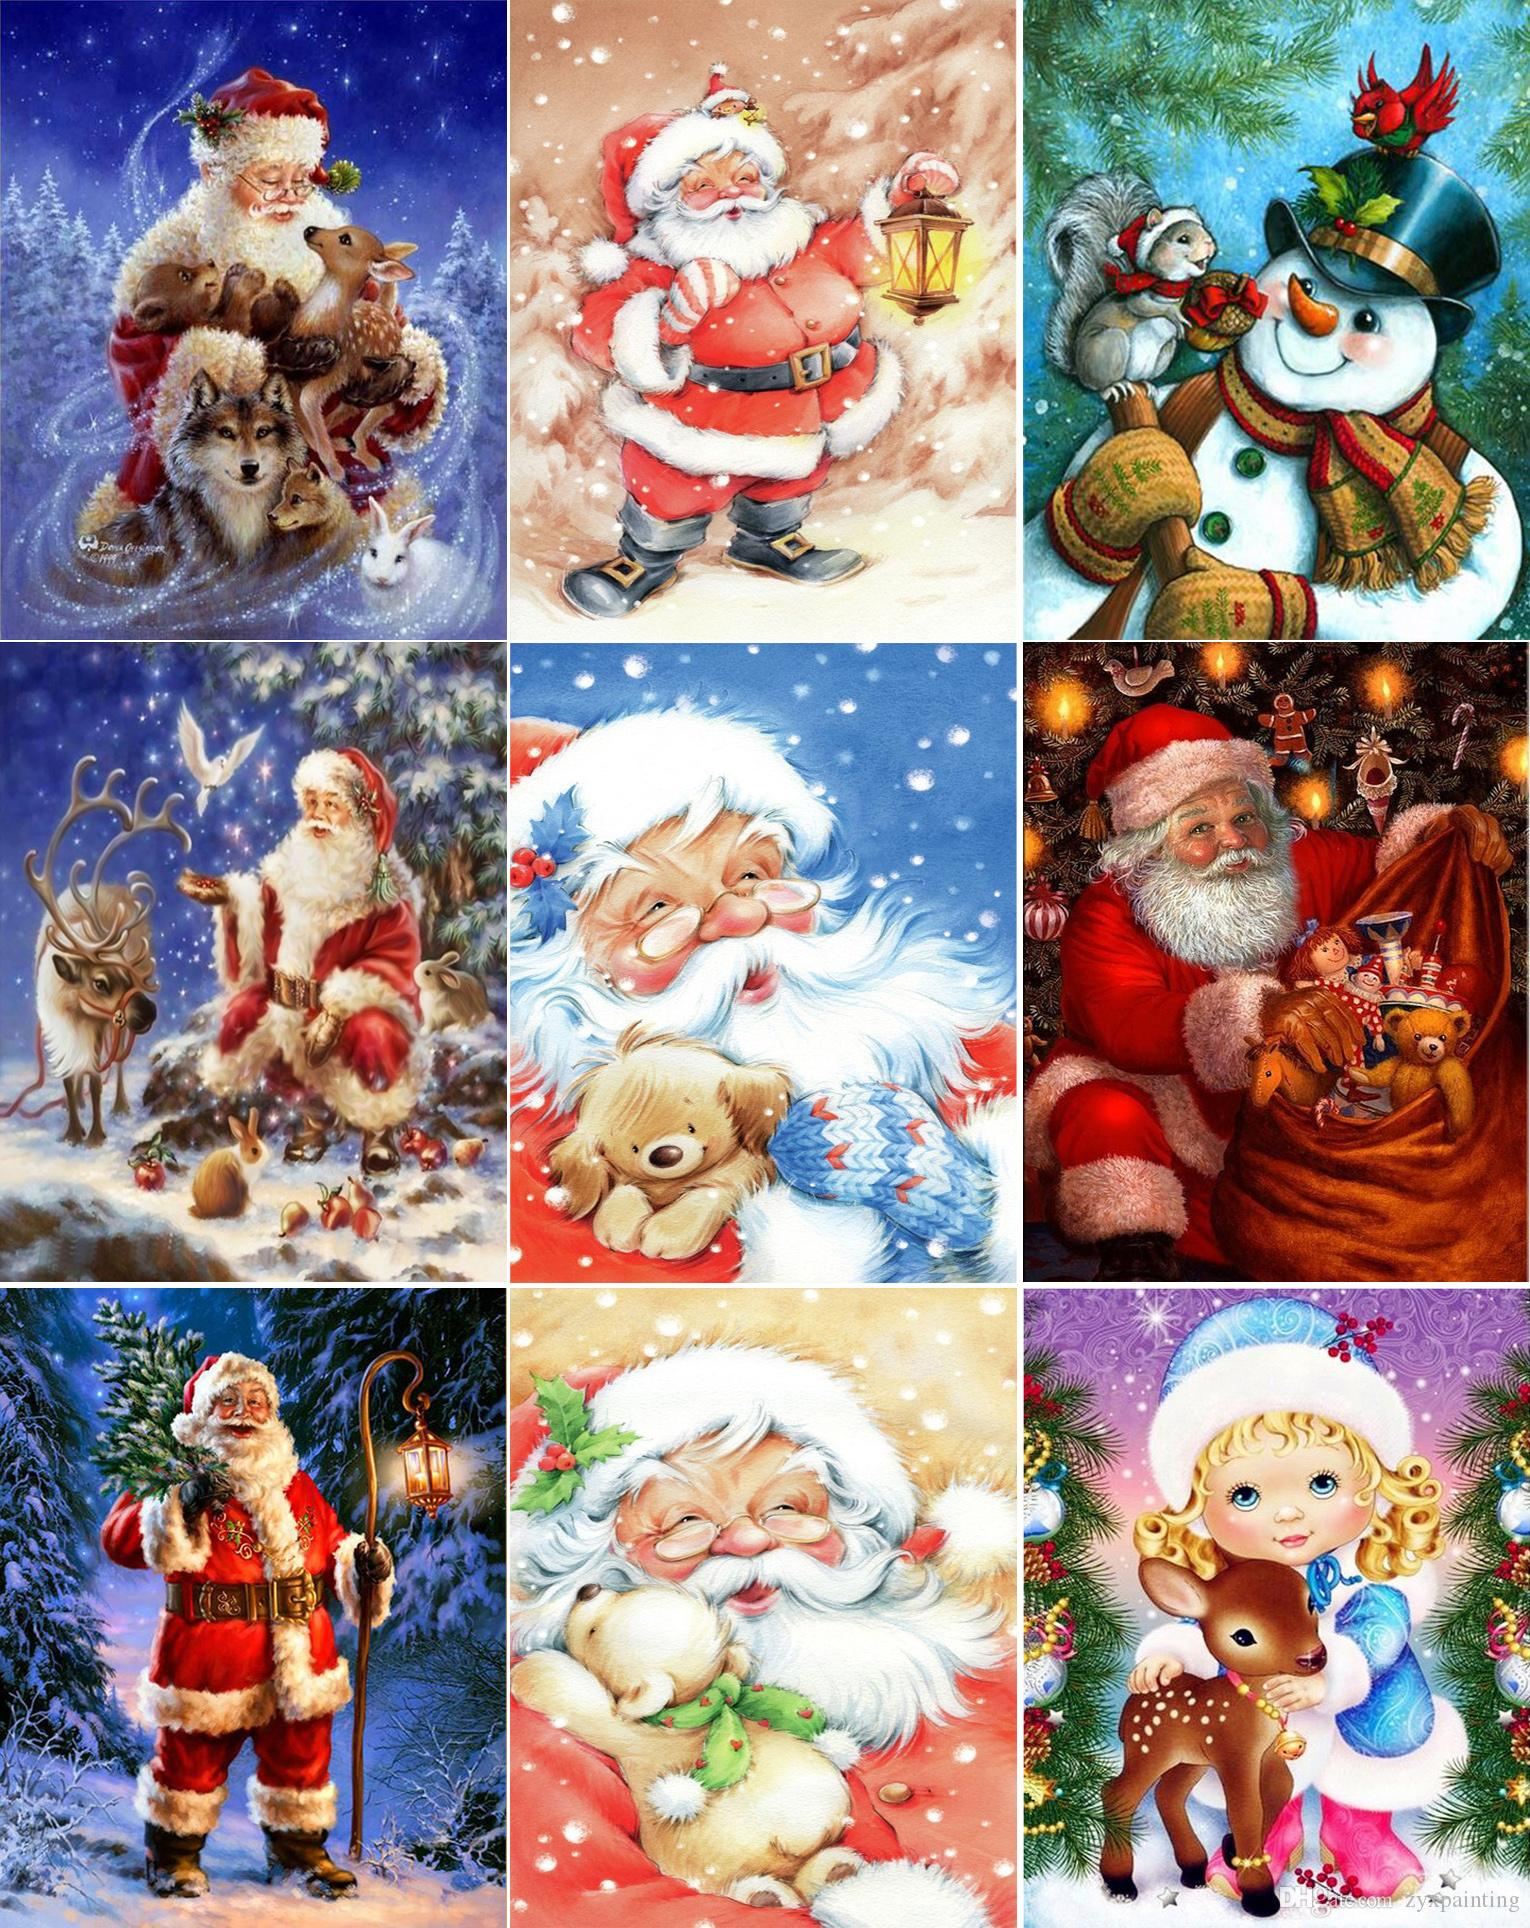 2019 Diy Diamond Painting Cross Stitch Kit Rhinestone Mosaic Home  Decoration Santa Claus Christmas Gift Painting Full Round Diamond  Embroidery 05 From ... 75d670eea